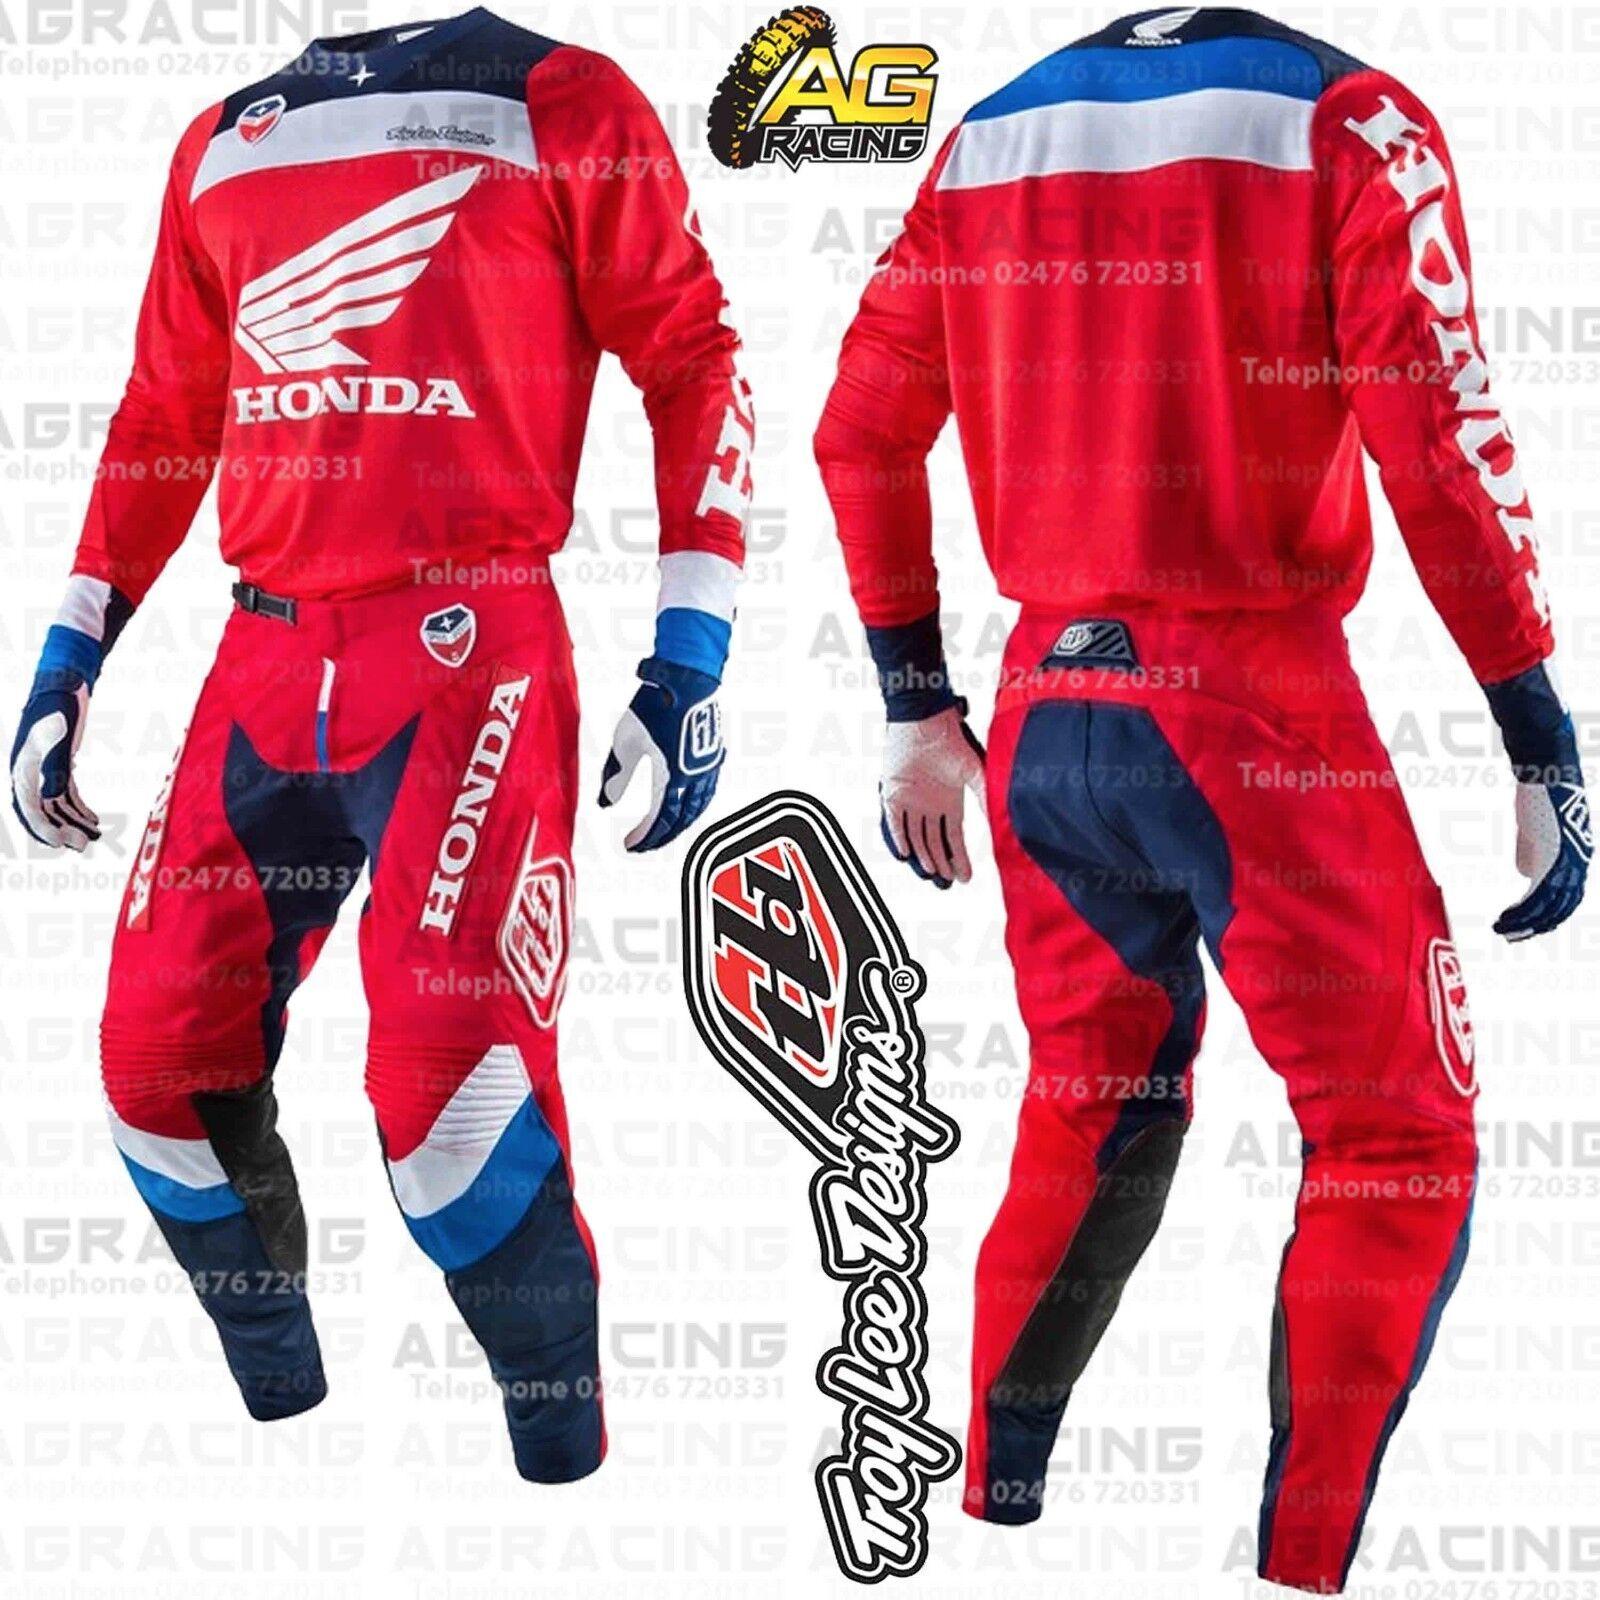 c271af472e8 Details about Troy Lee Designs SE Air Corsa Honda Red White Blue SM Jersey  30